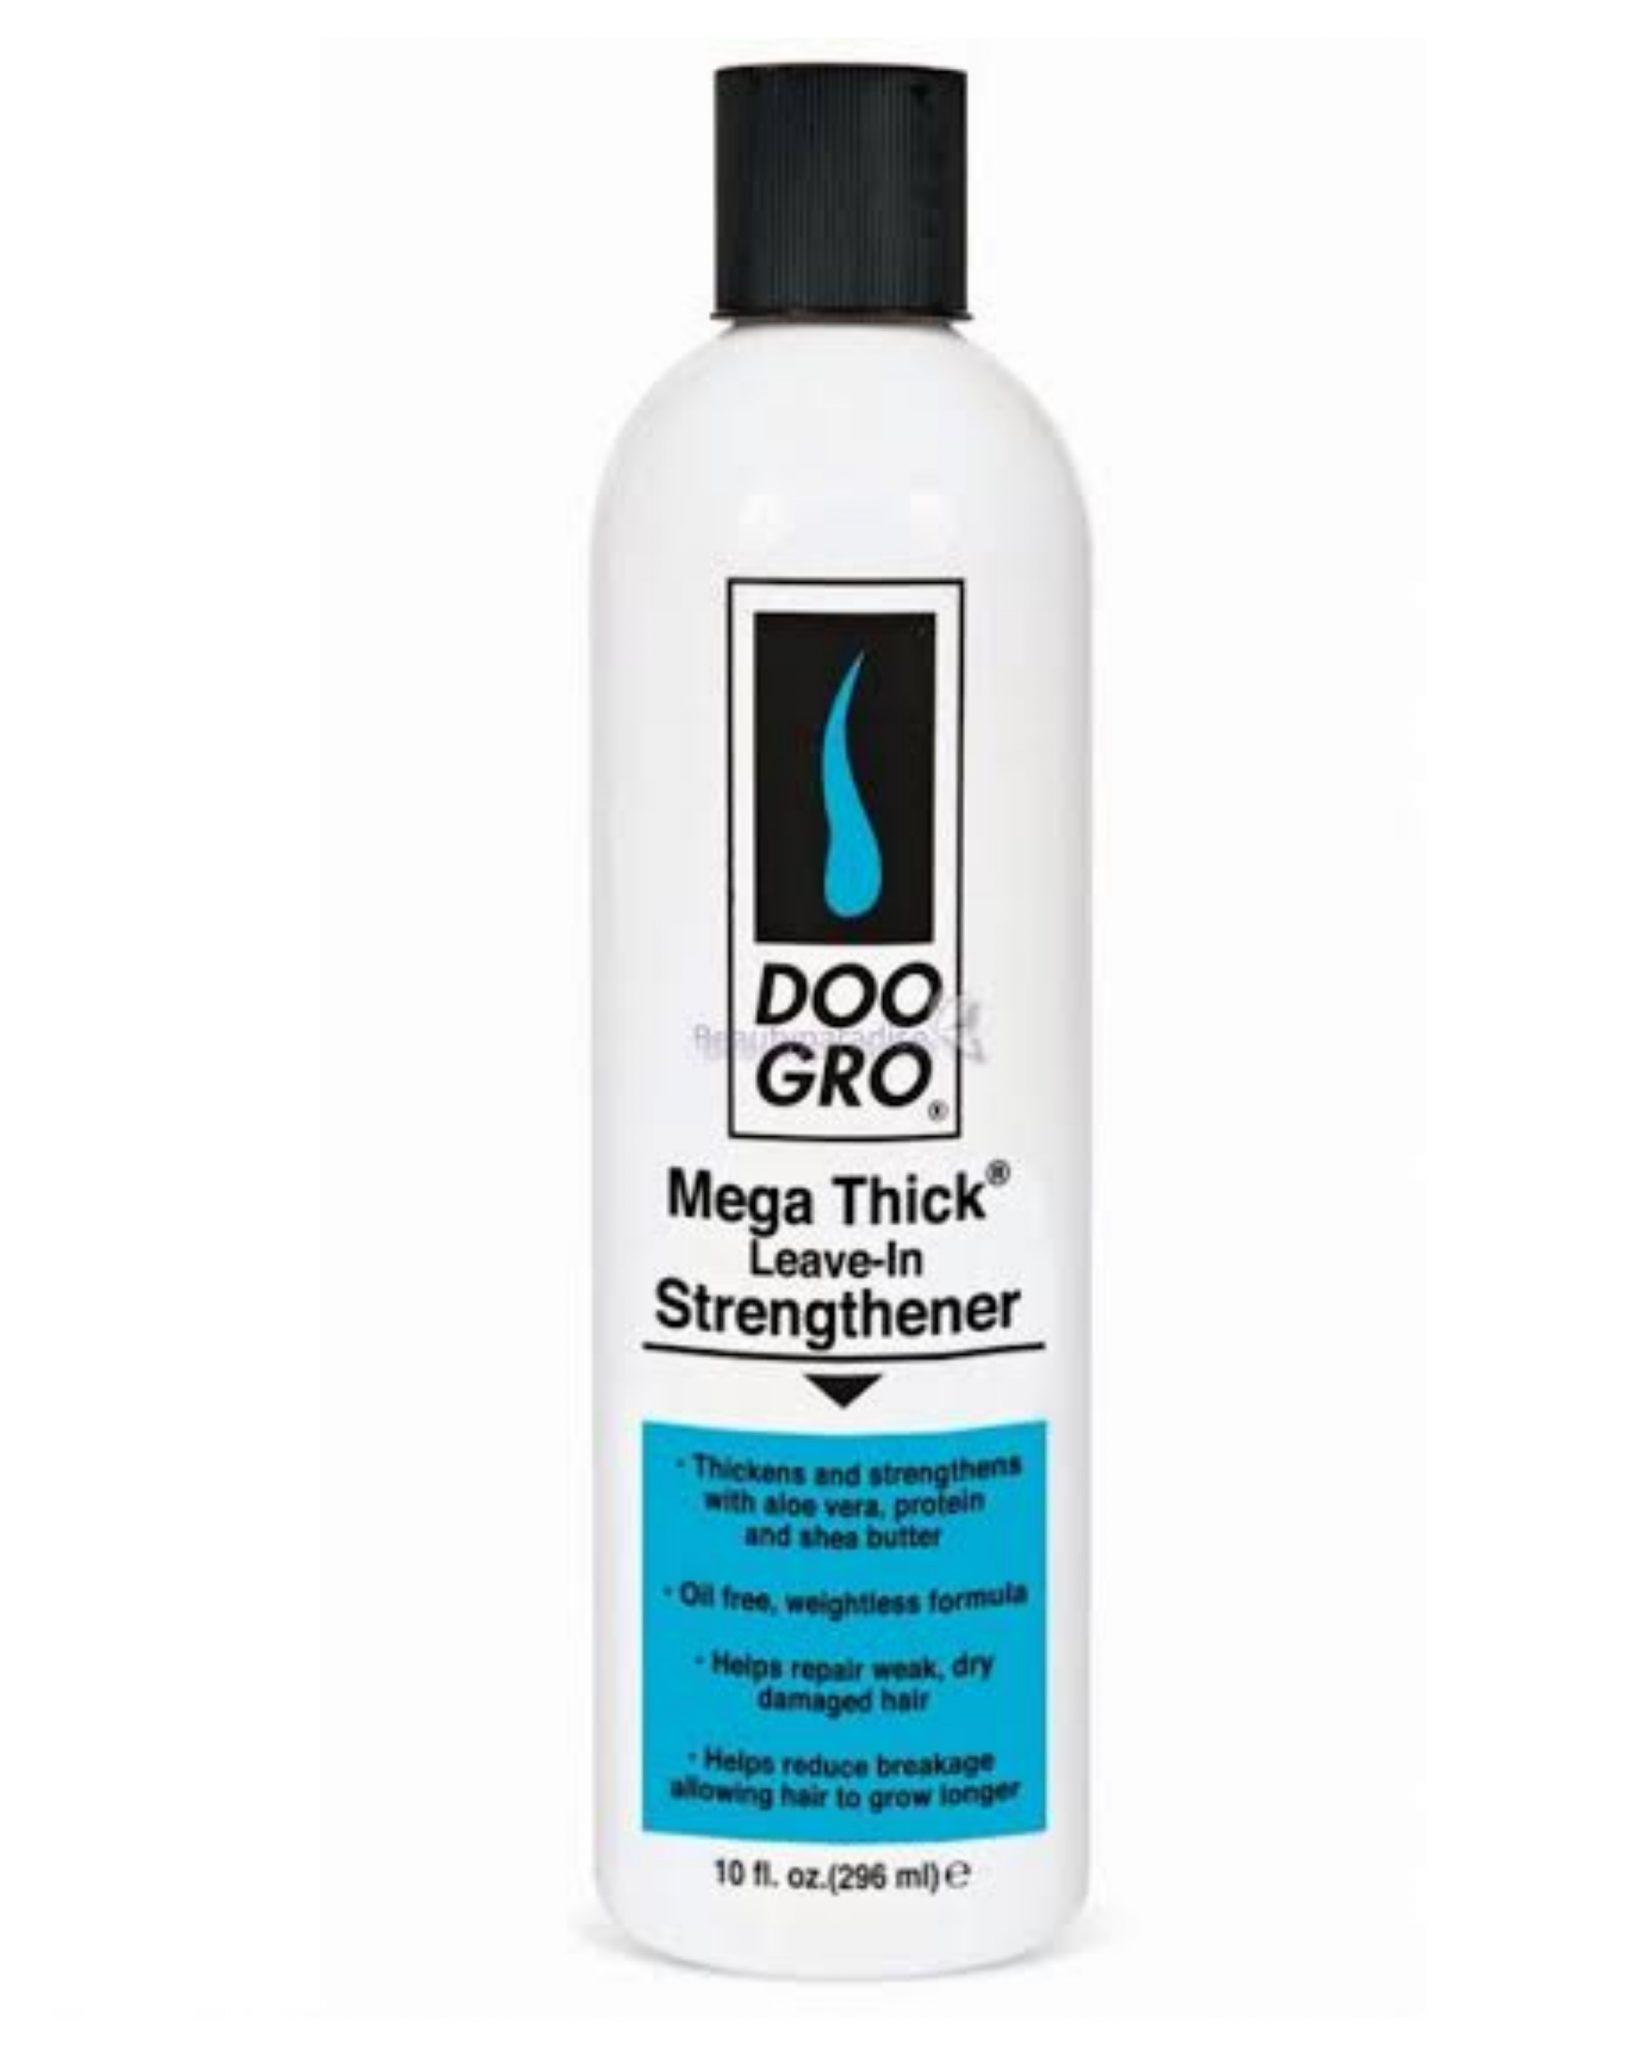 Doo Gro Mega Thick Leave-in Strengthener 10Oz